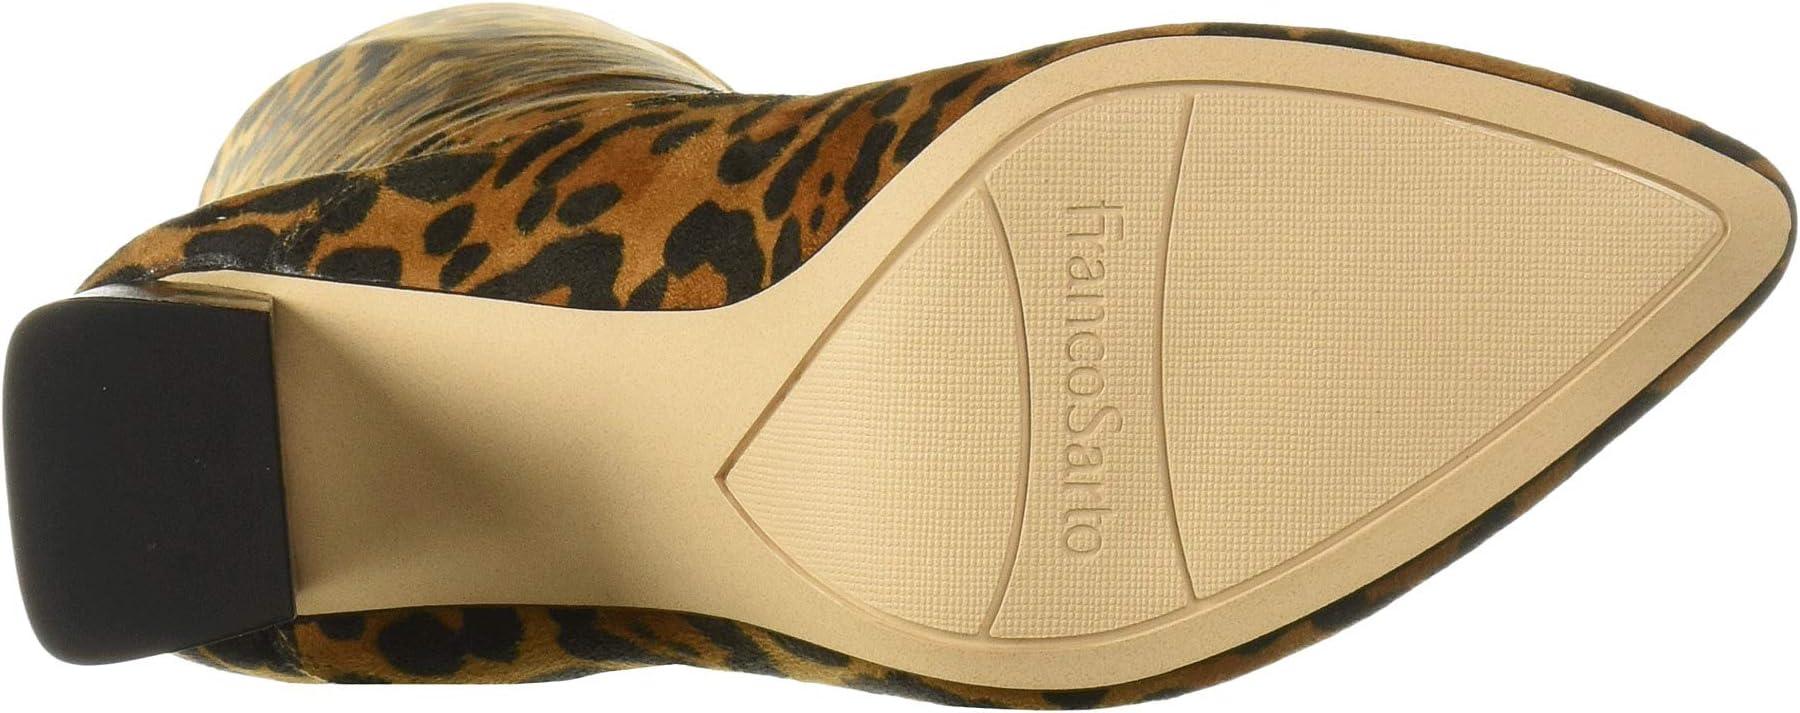 Franco Sarto Katherine | Women's shoes | 2020 Newest